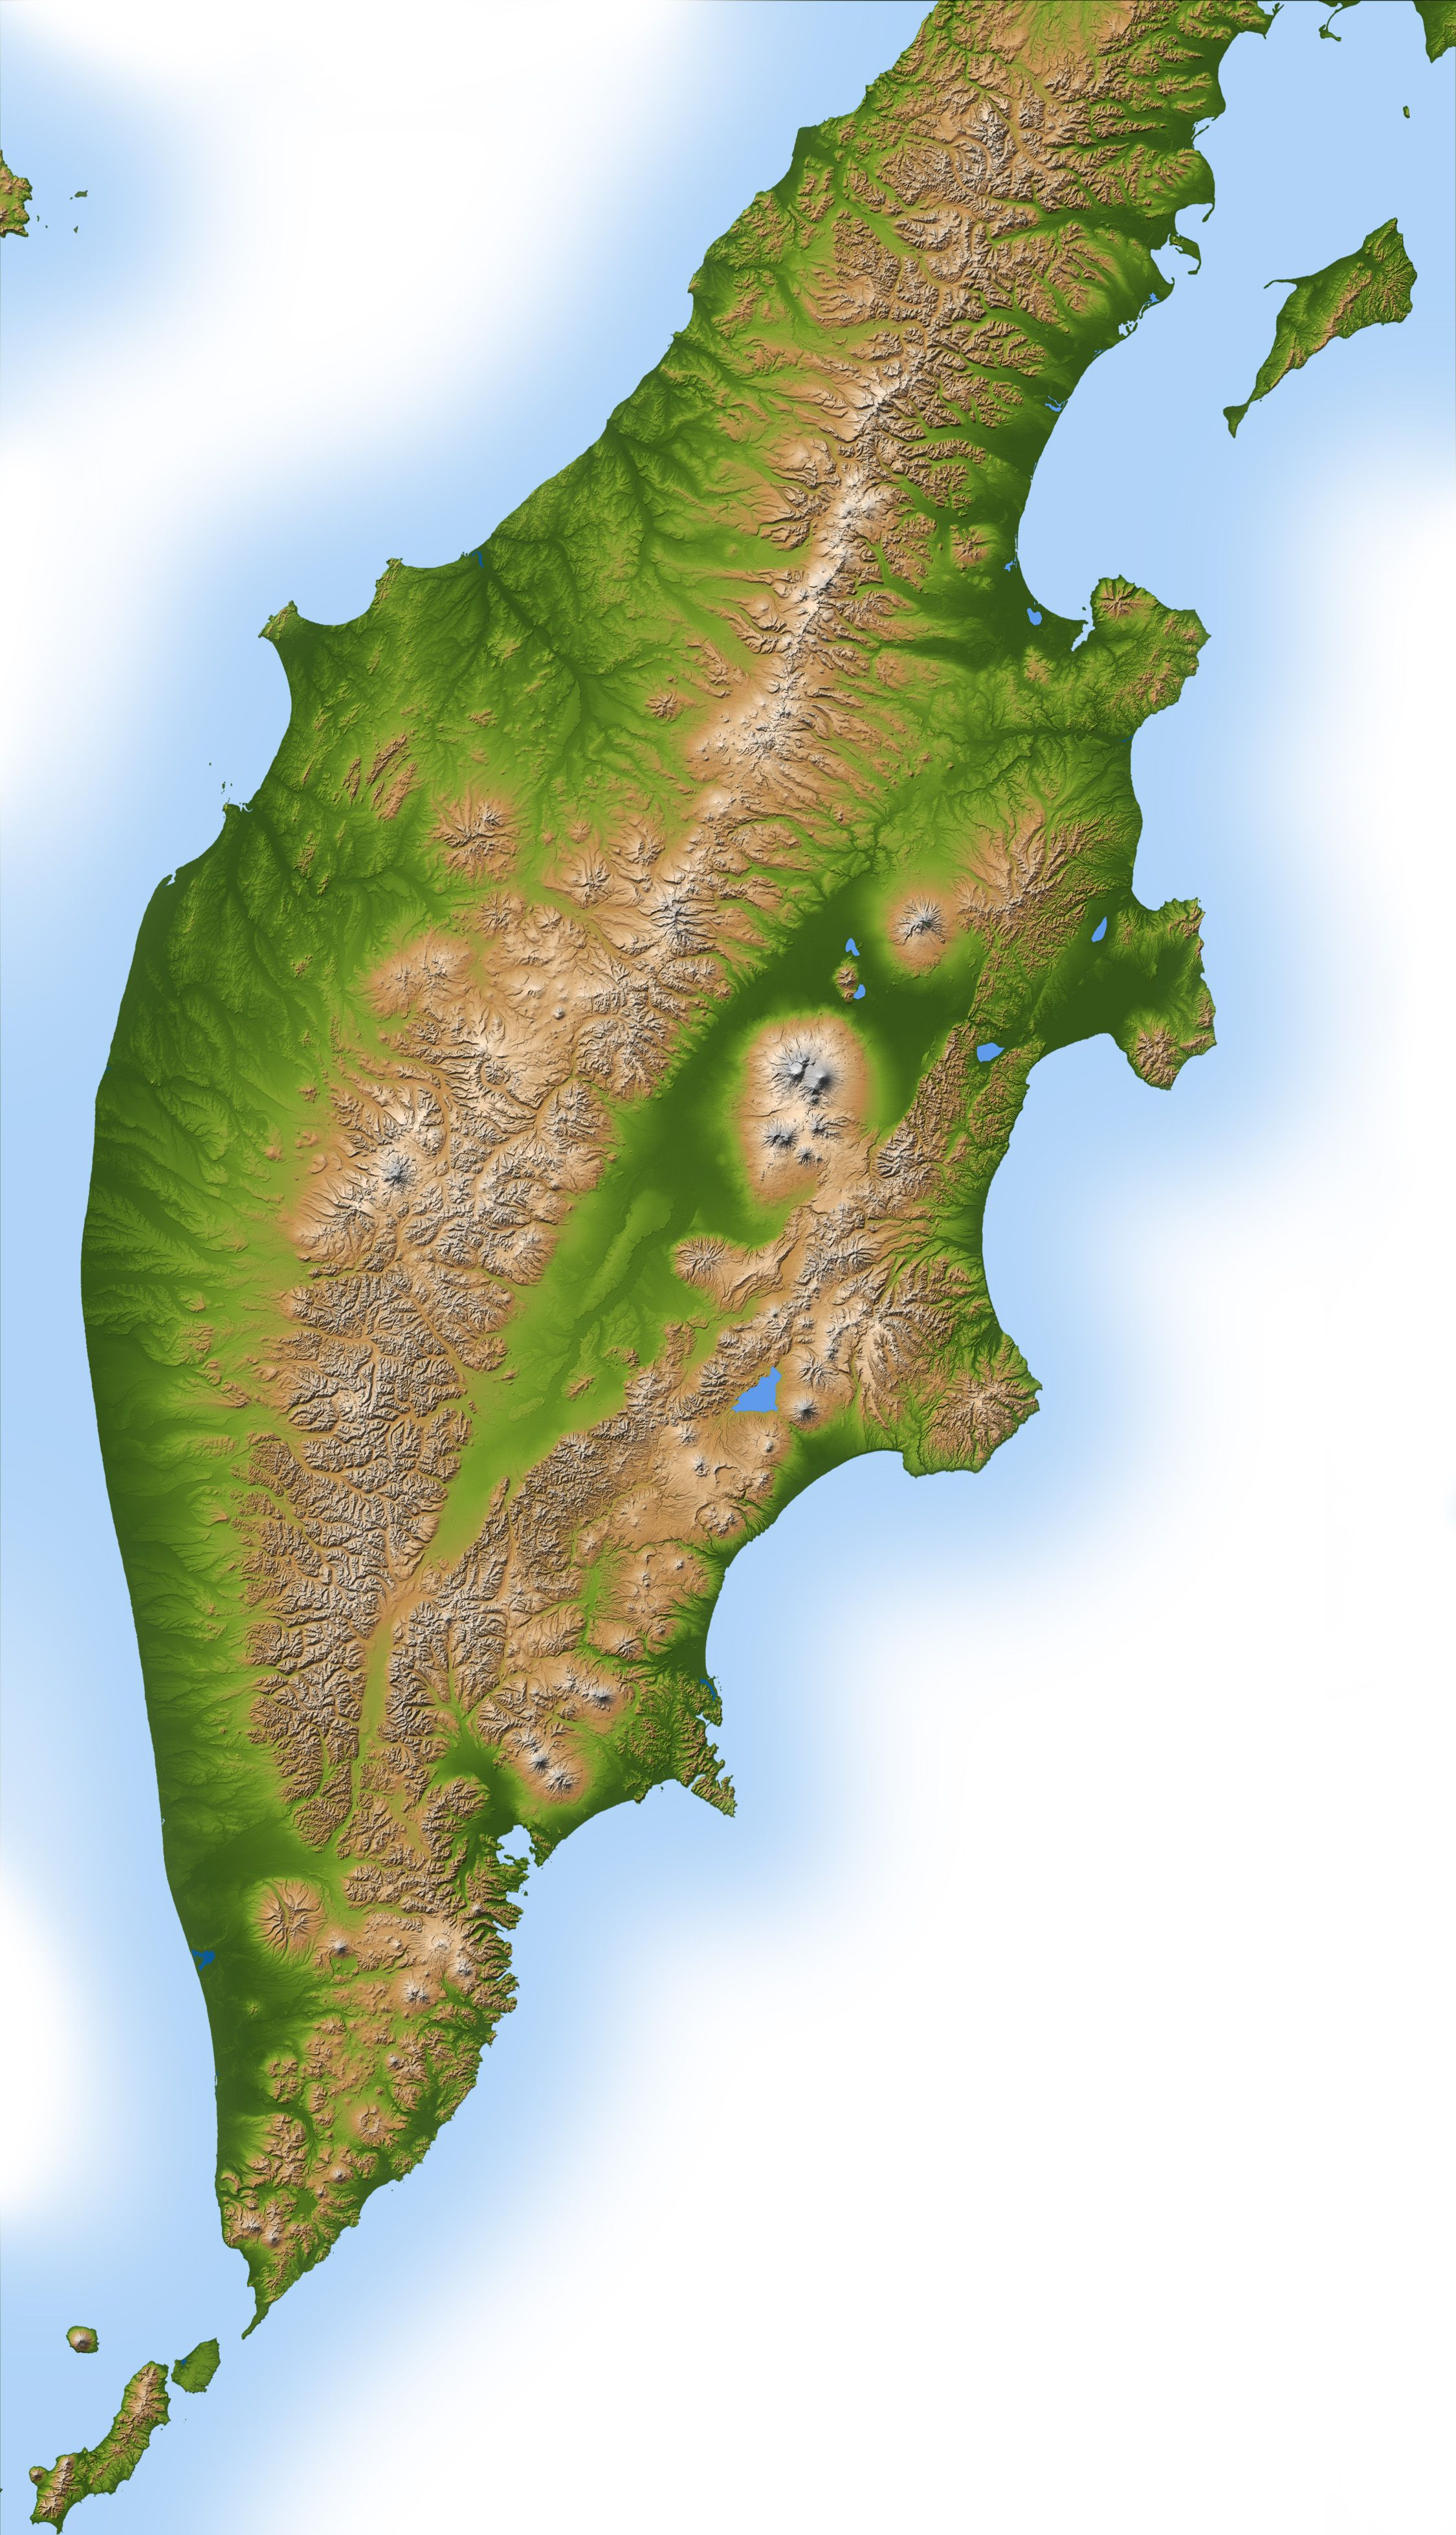 Terrain Map Kamchatka Peninsula Kamchatka Pinterest Global - Global terrain map